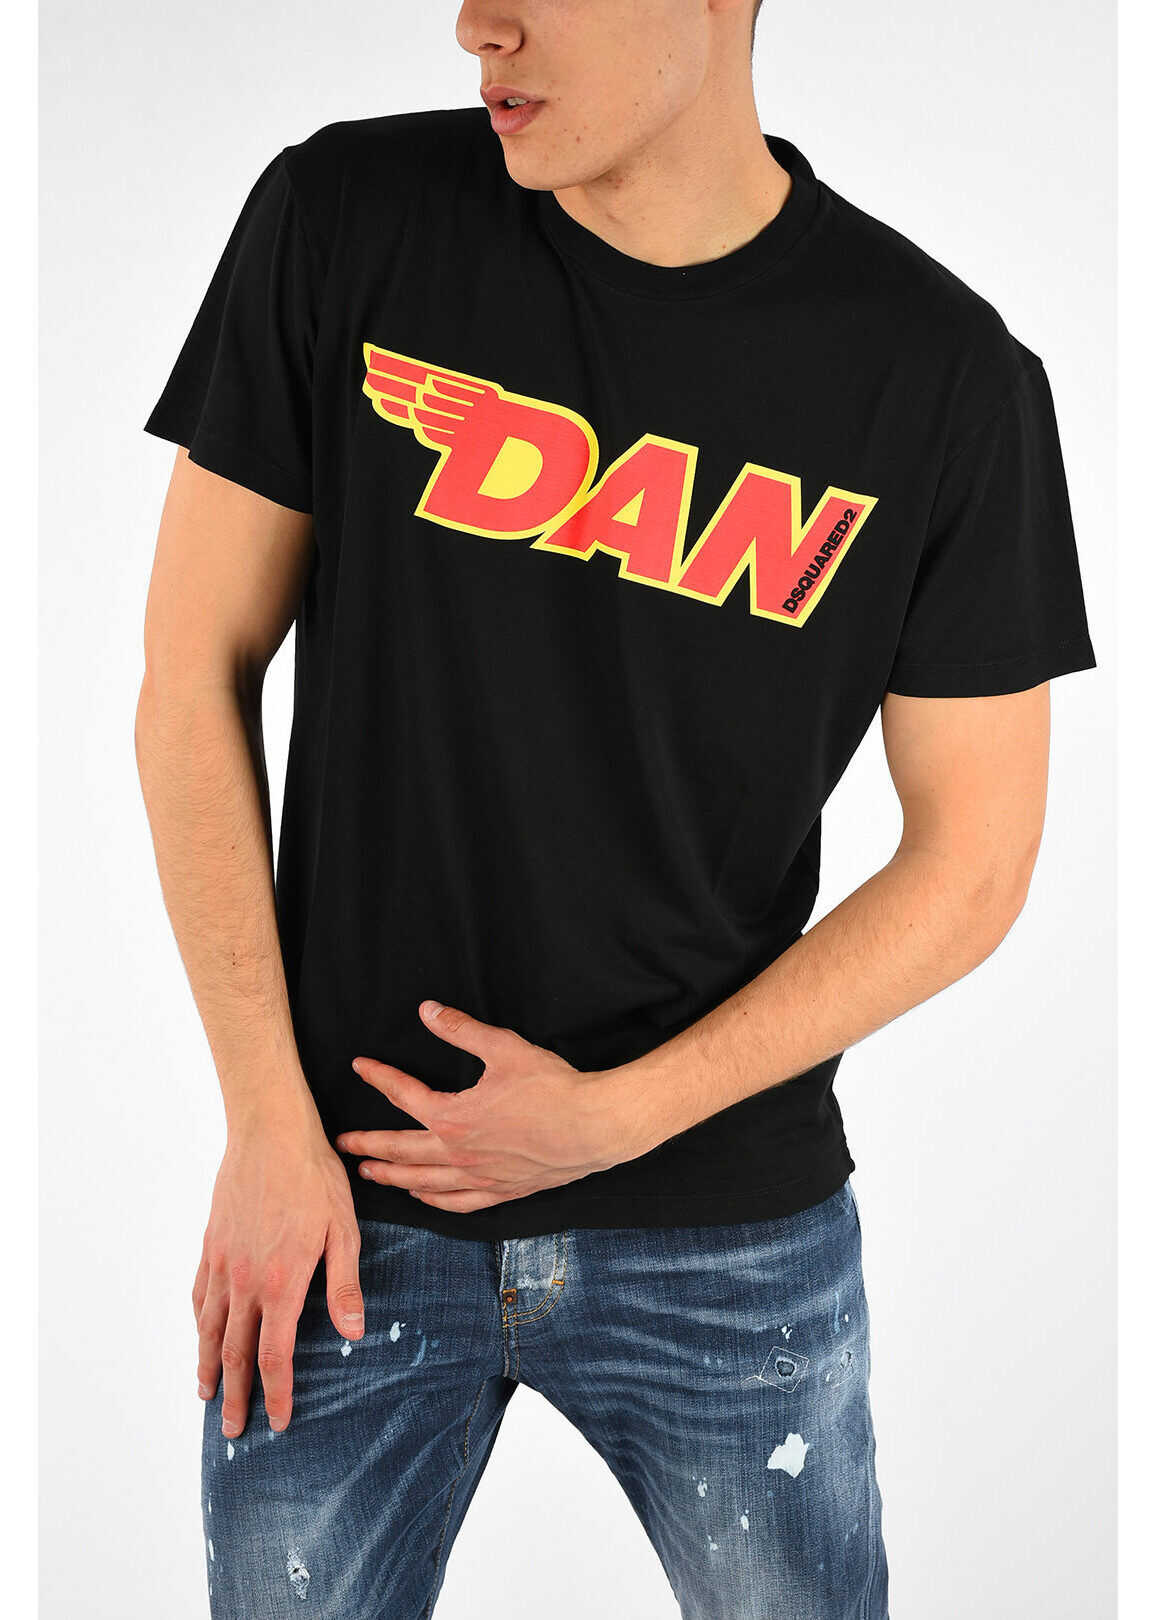 DSQUARED2 T-shirt with DAN Print BLACK